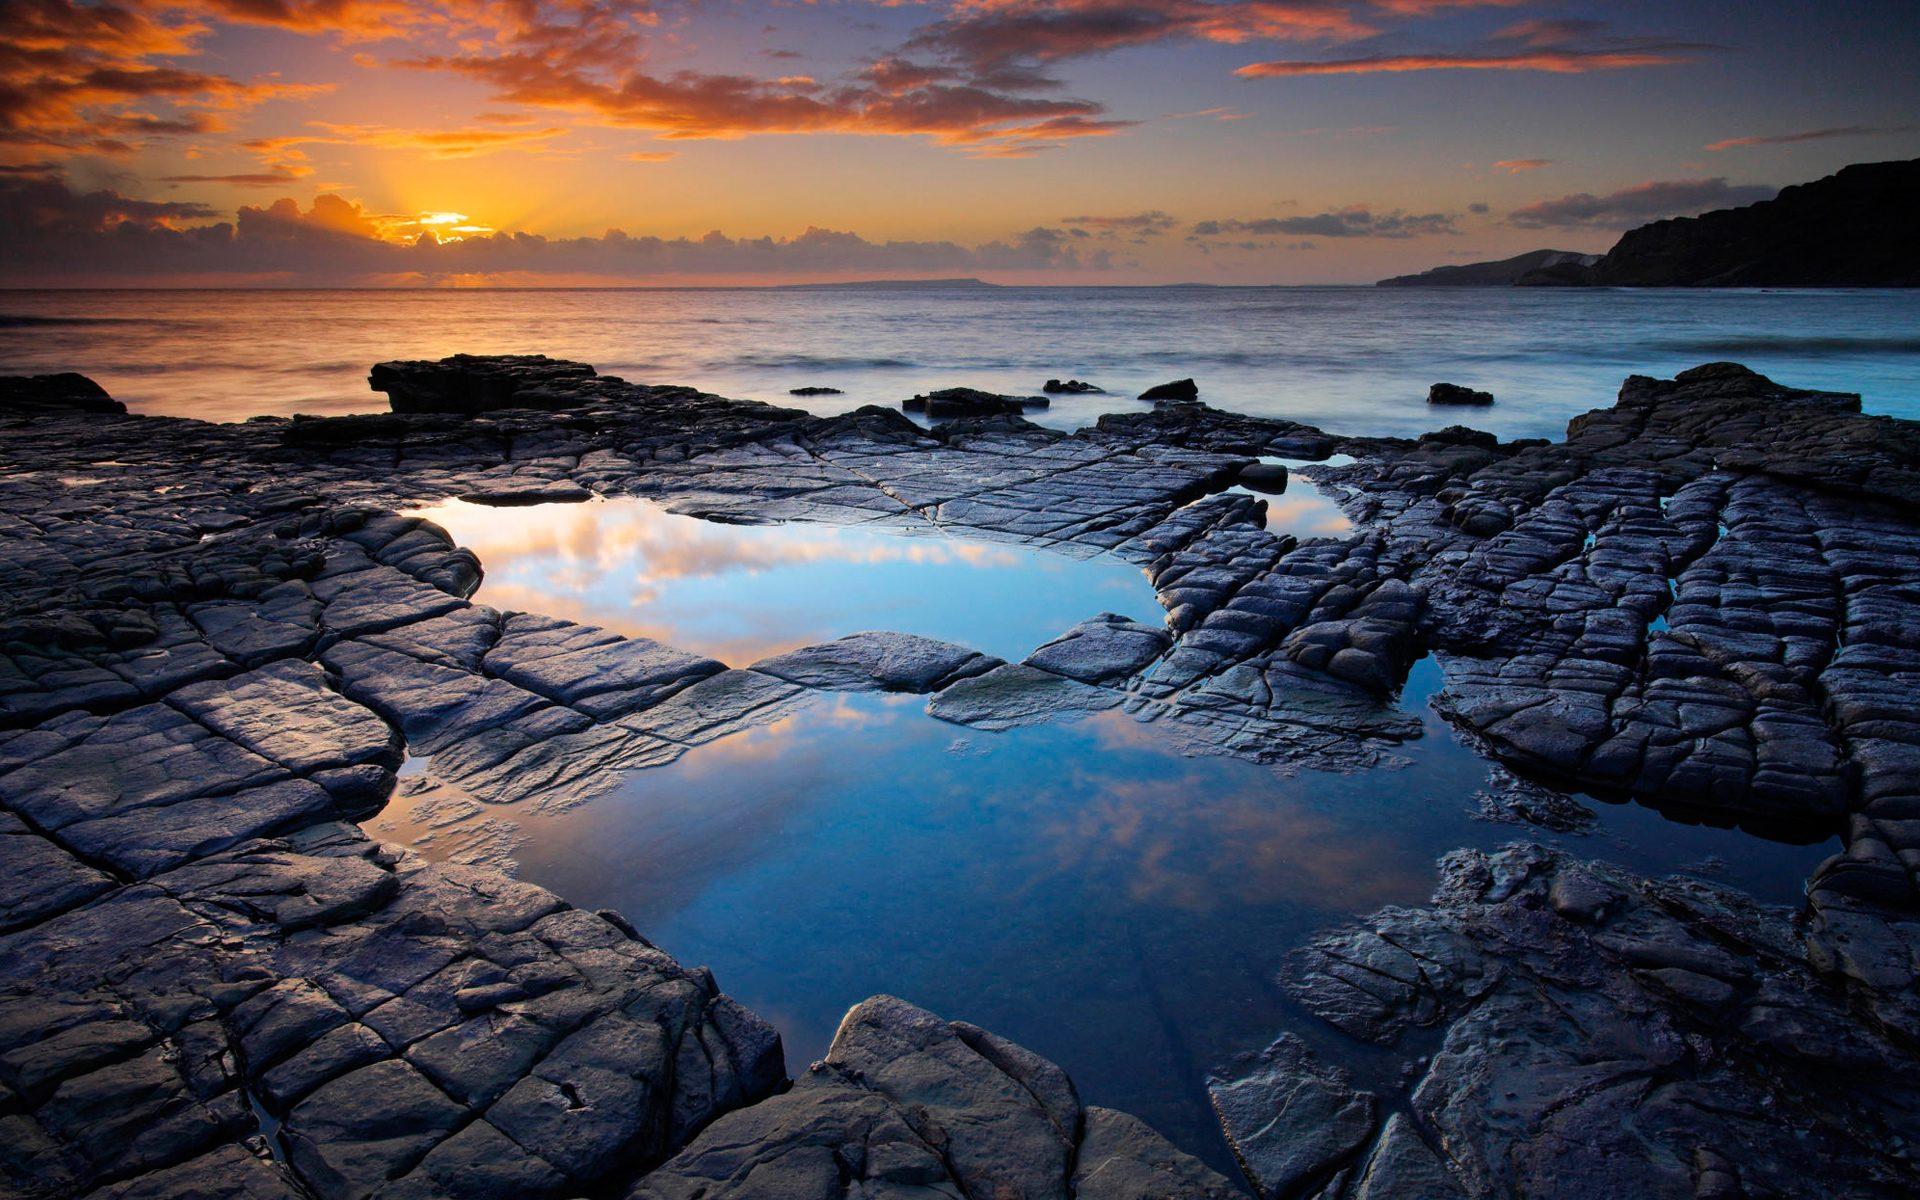 Rock pool background photo